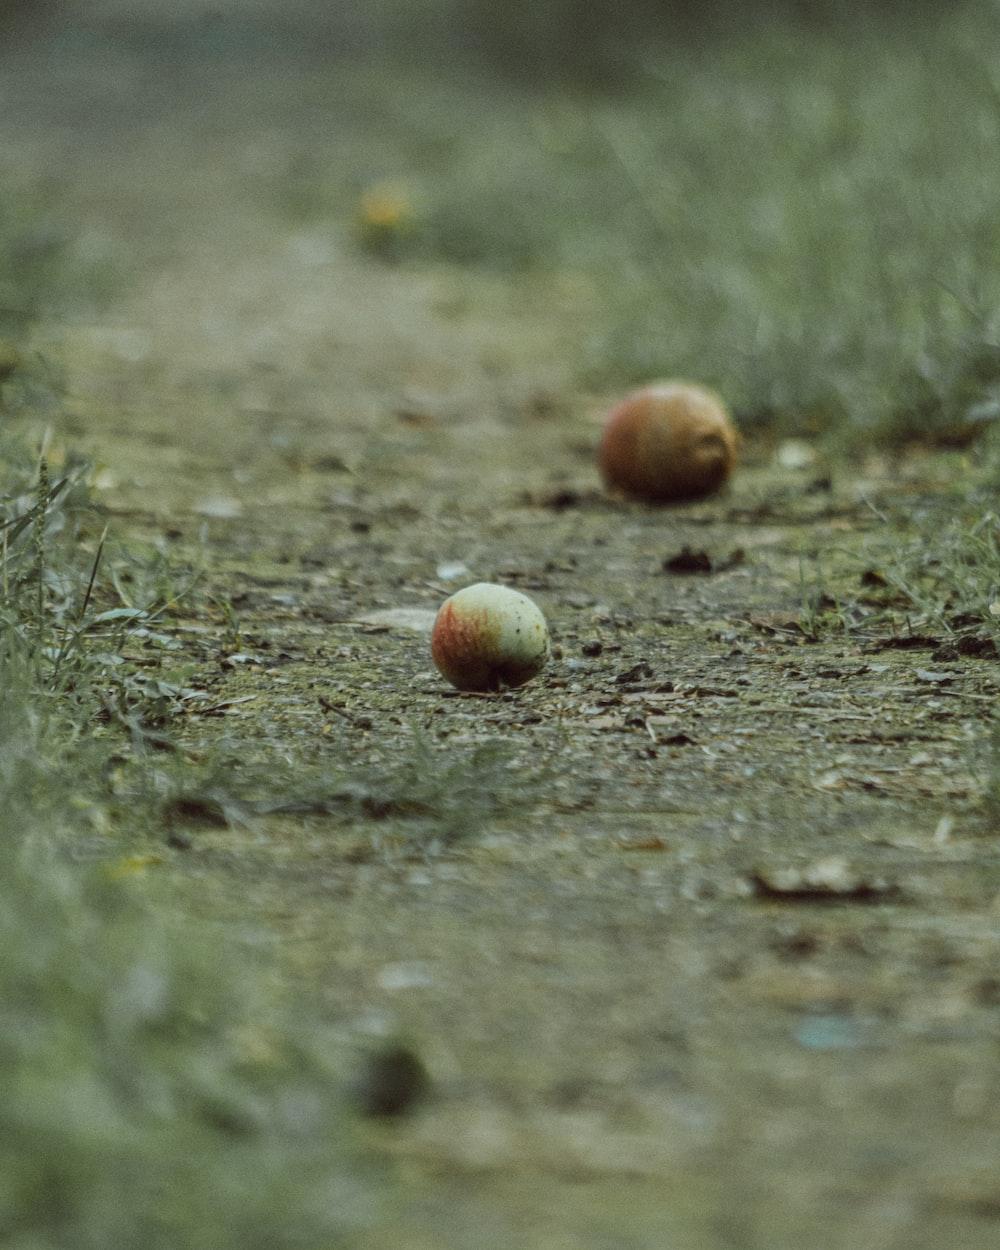 brown round fruit on green grass during daytime